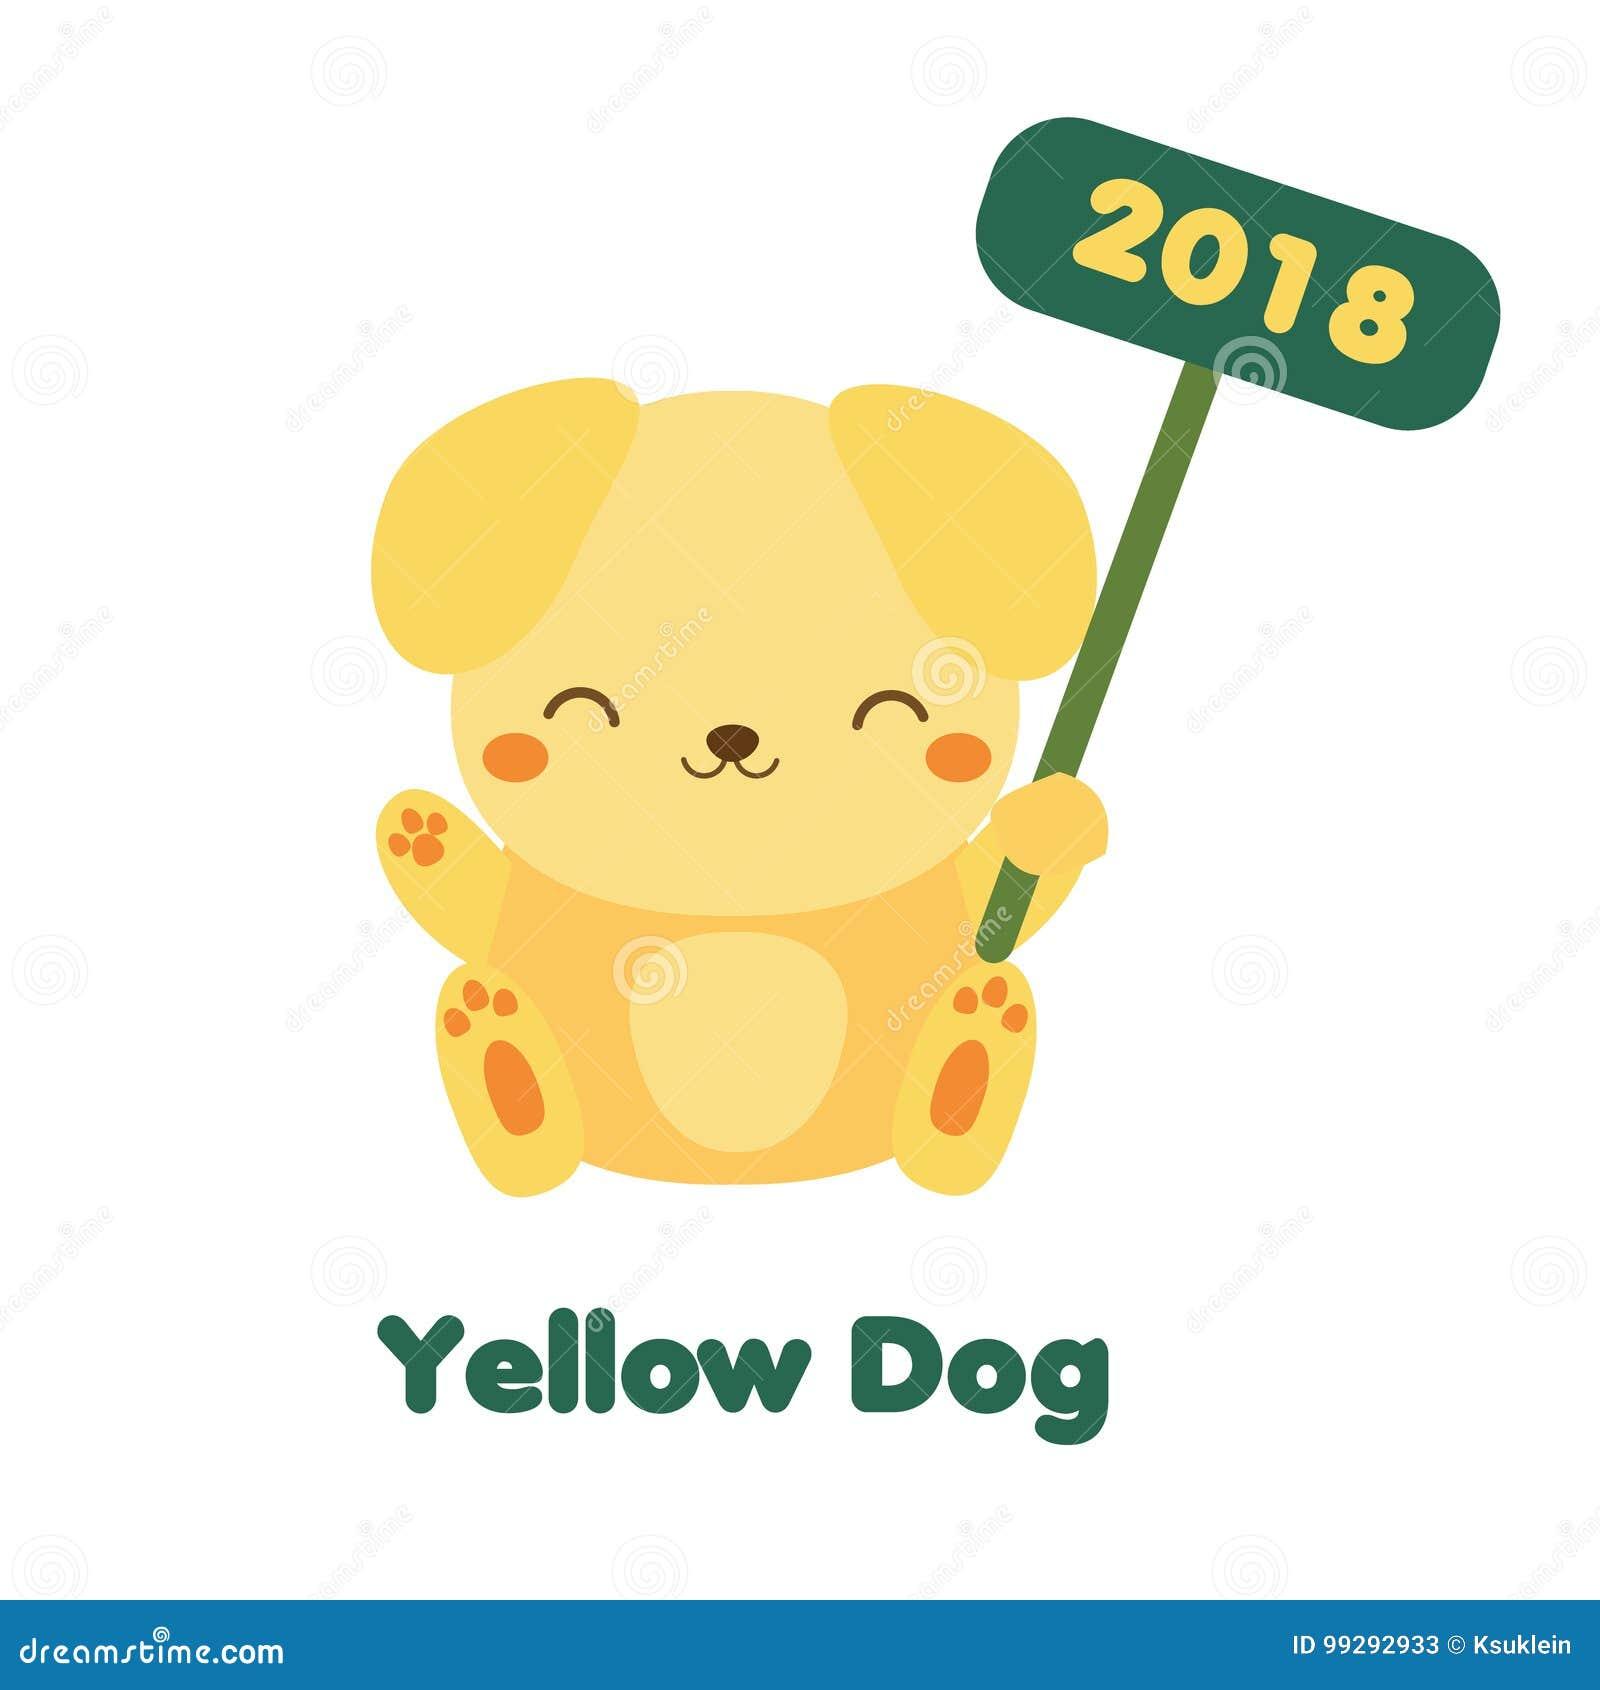 Cute yellow dog in cartoon style 2018 new year symbol icon cute yellow dog in cartoon style 2018 new year symbol icon design element biocorpaavc